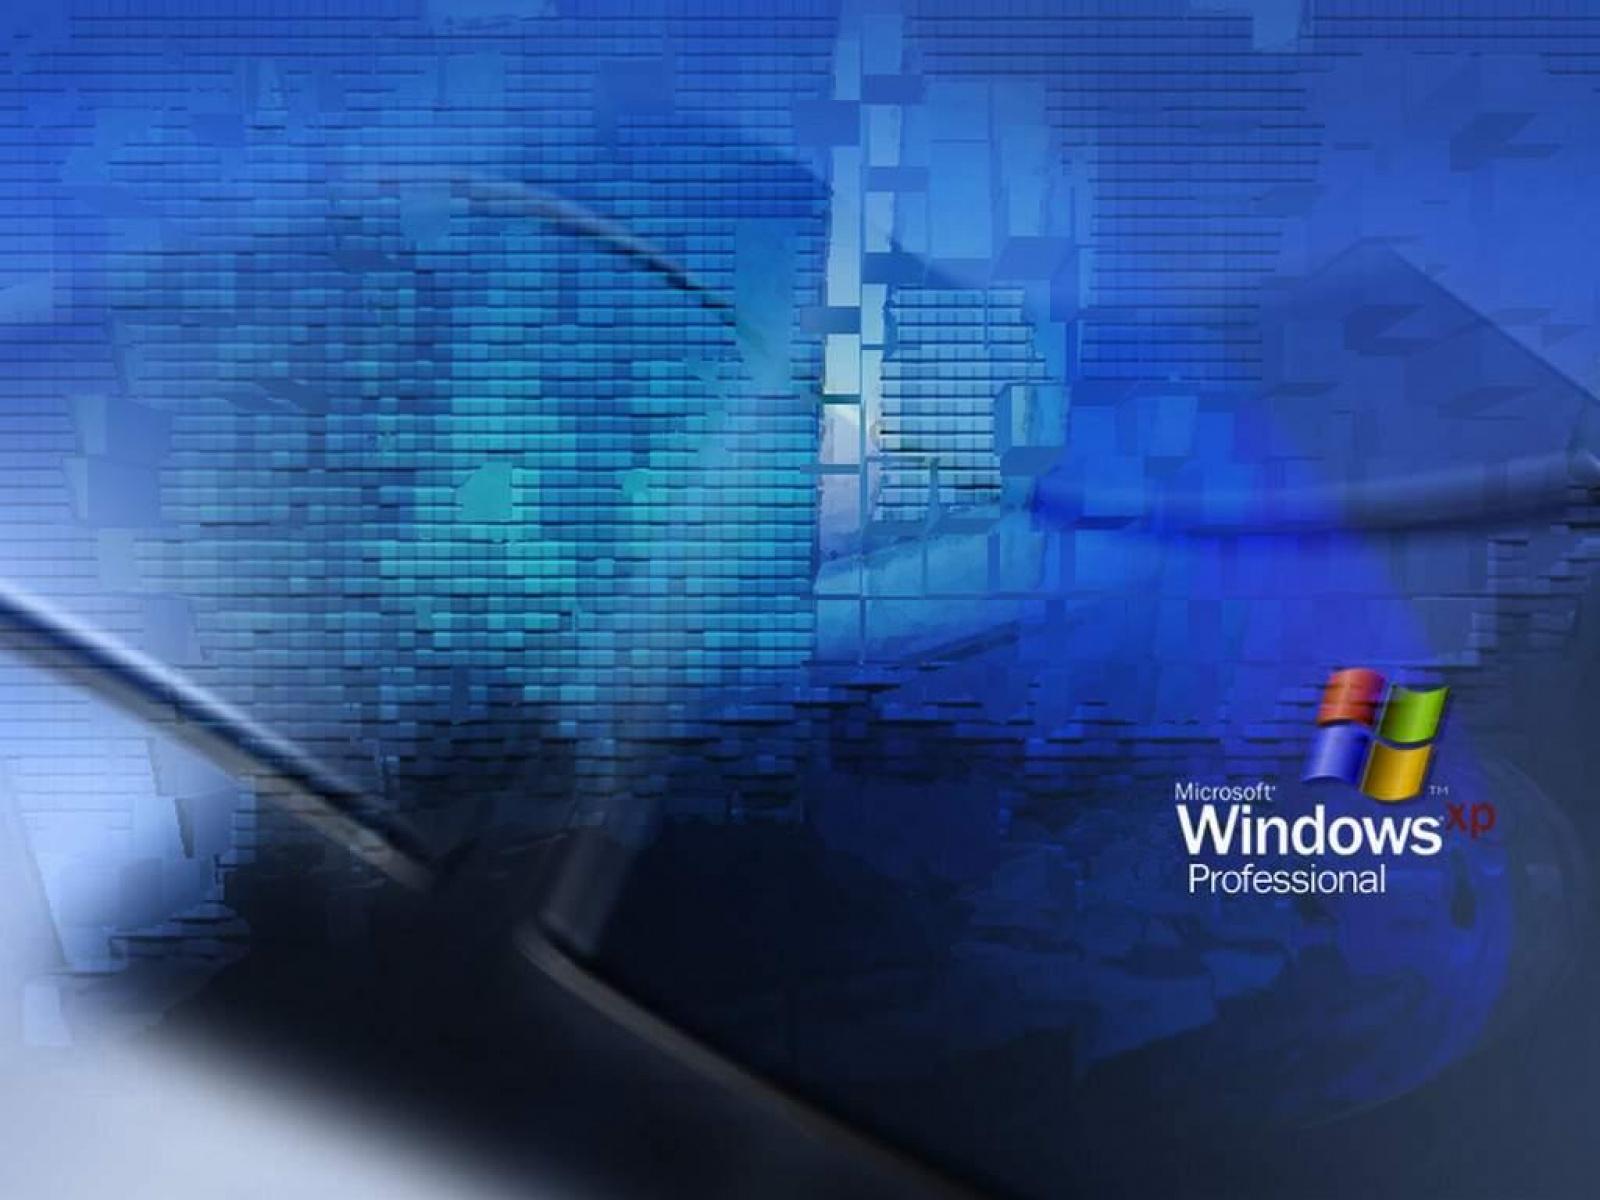 Original Windows XP Wallpaper